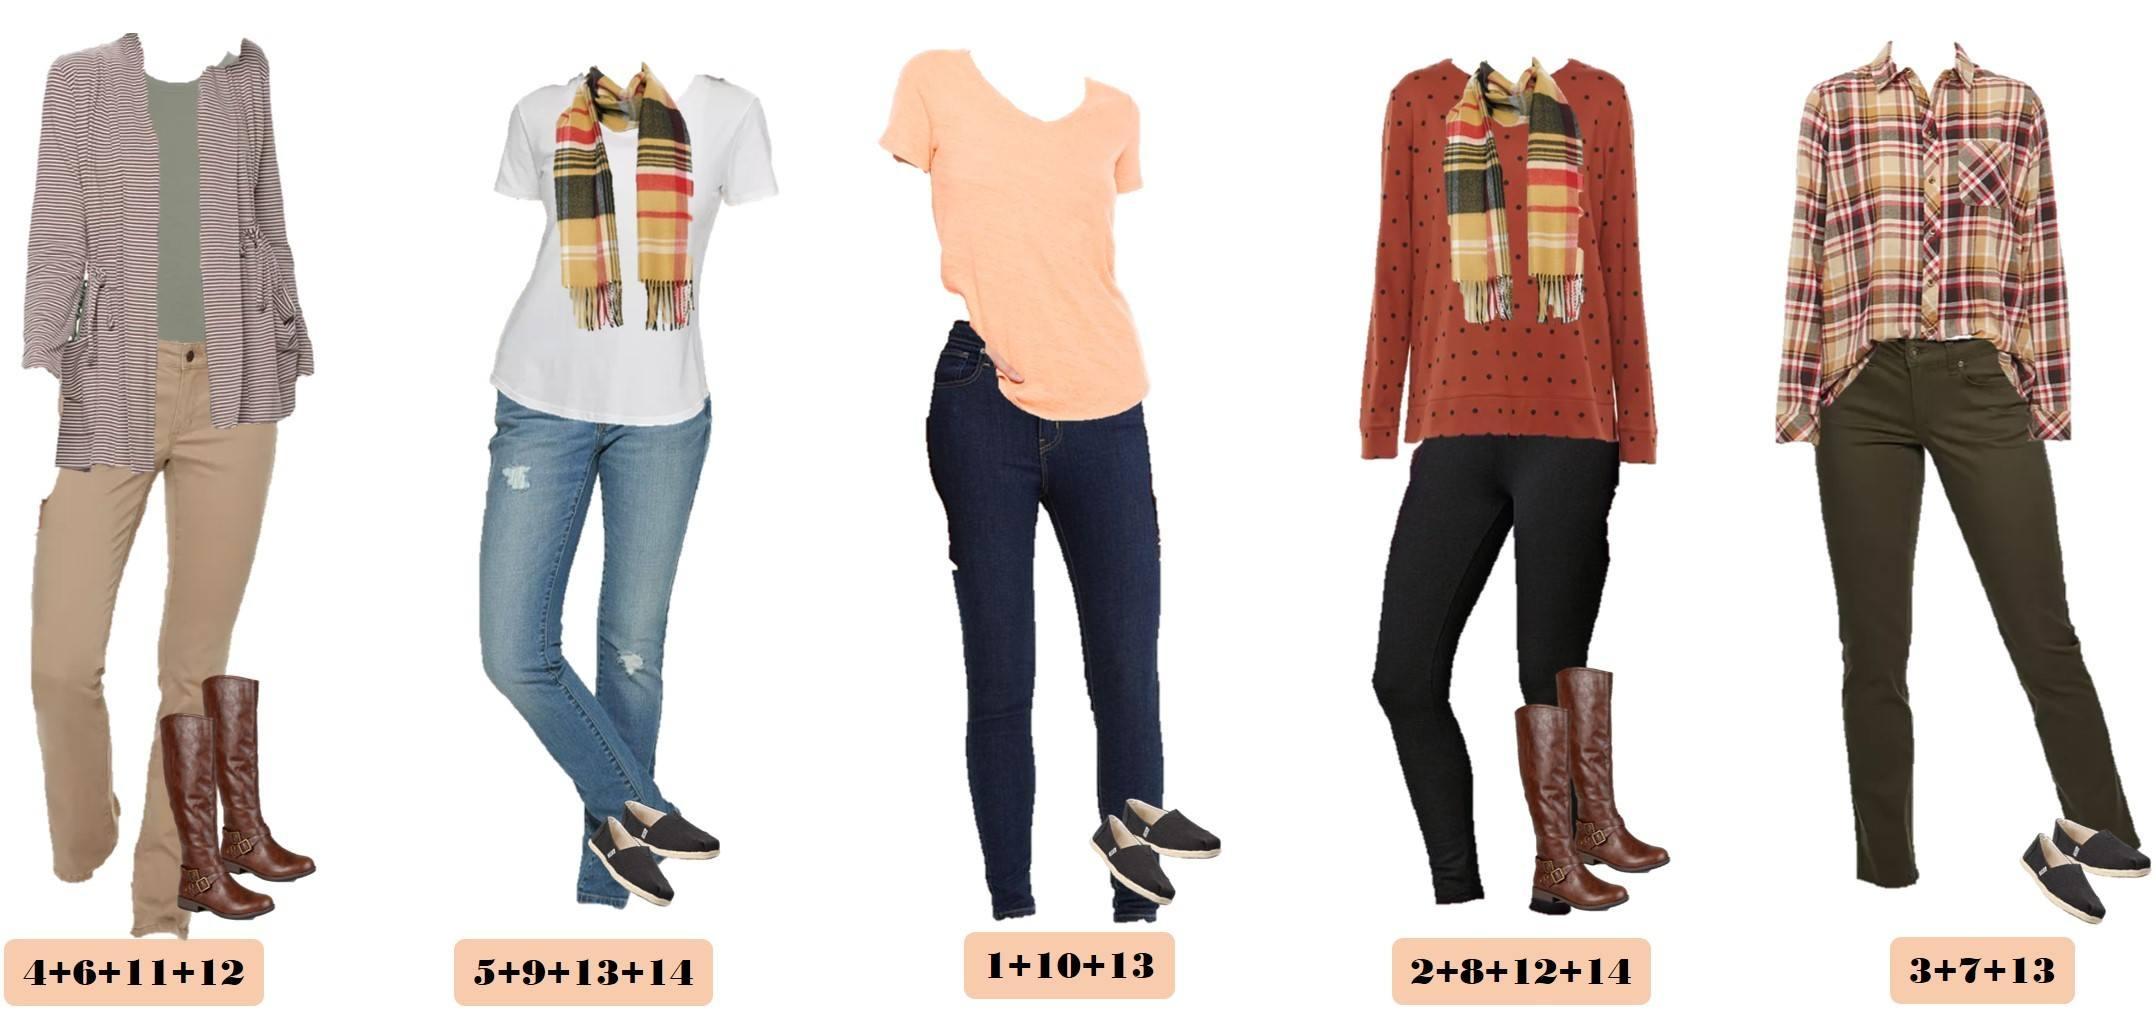 cute fall outfits from Kohls - toms shoes, jeans, khaki pants, plaid shirt, cozy sweatshirt